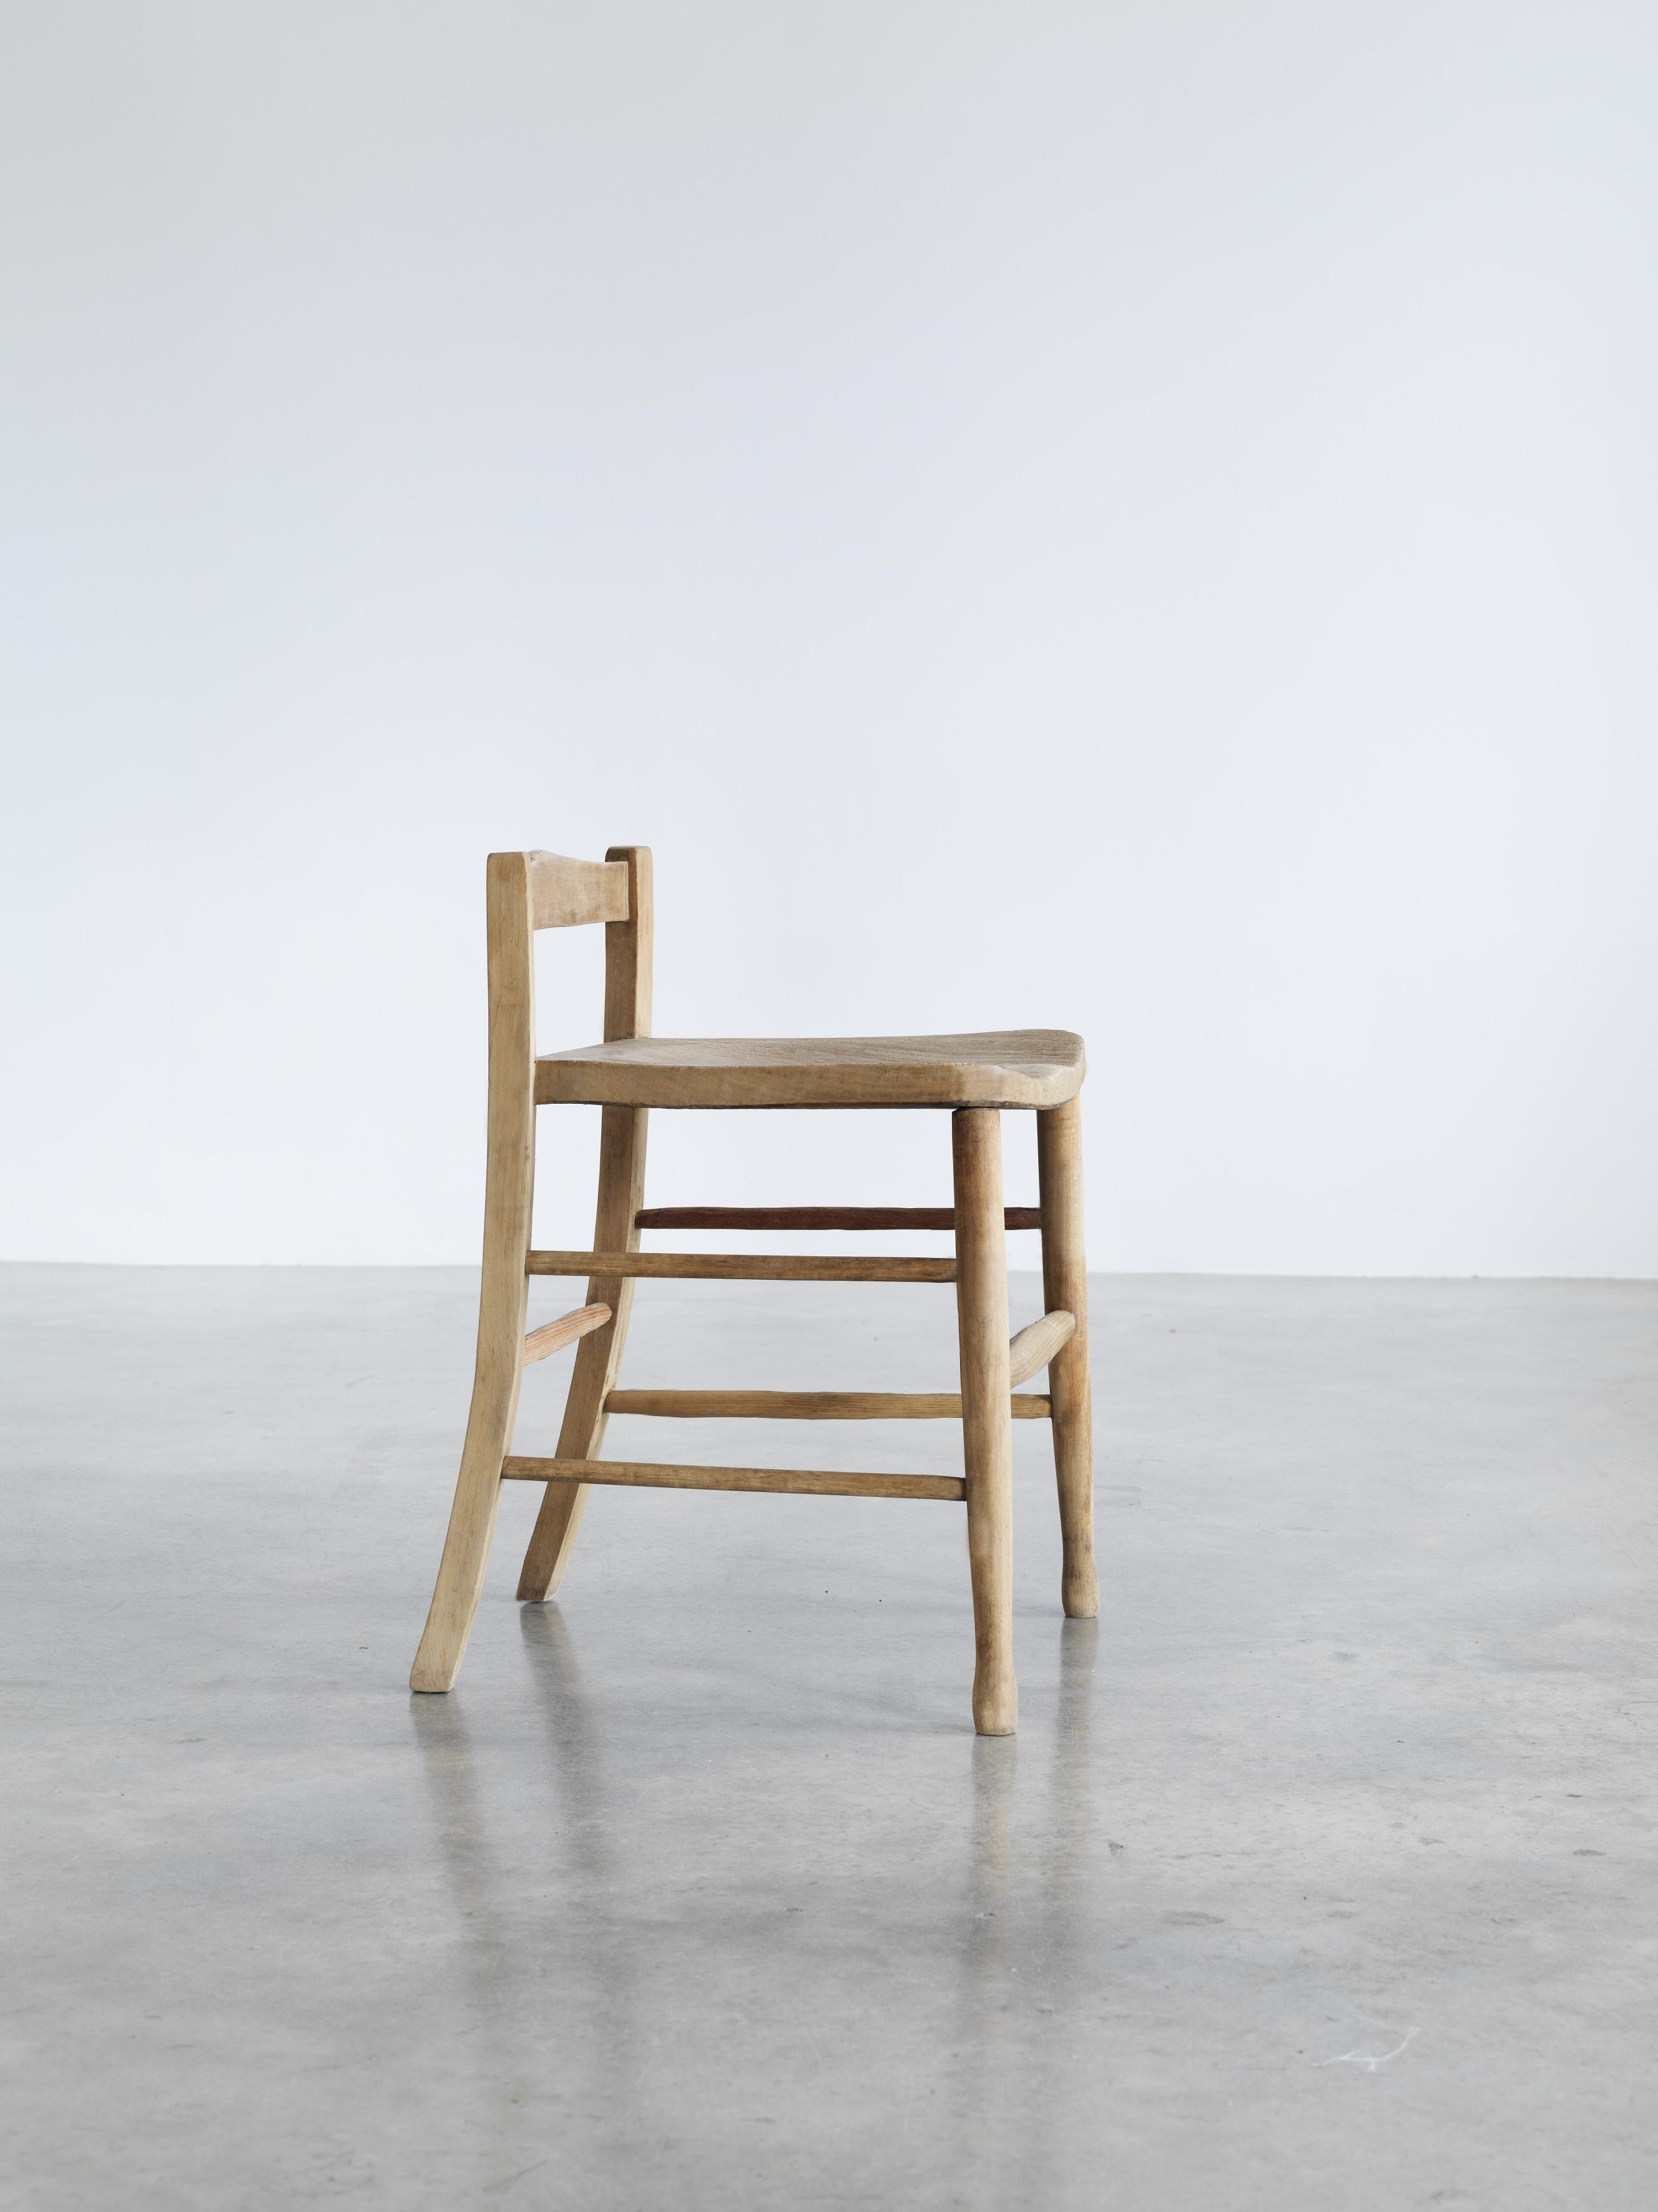 Roha chair Sasa works